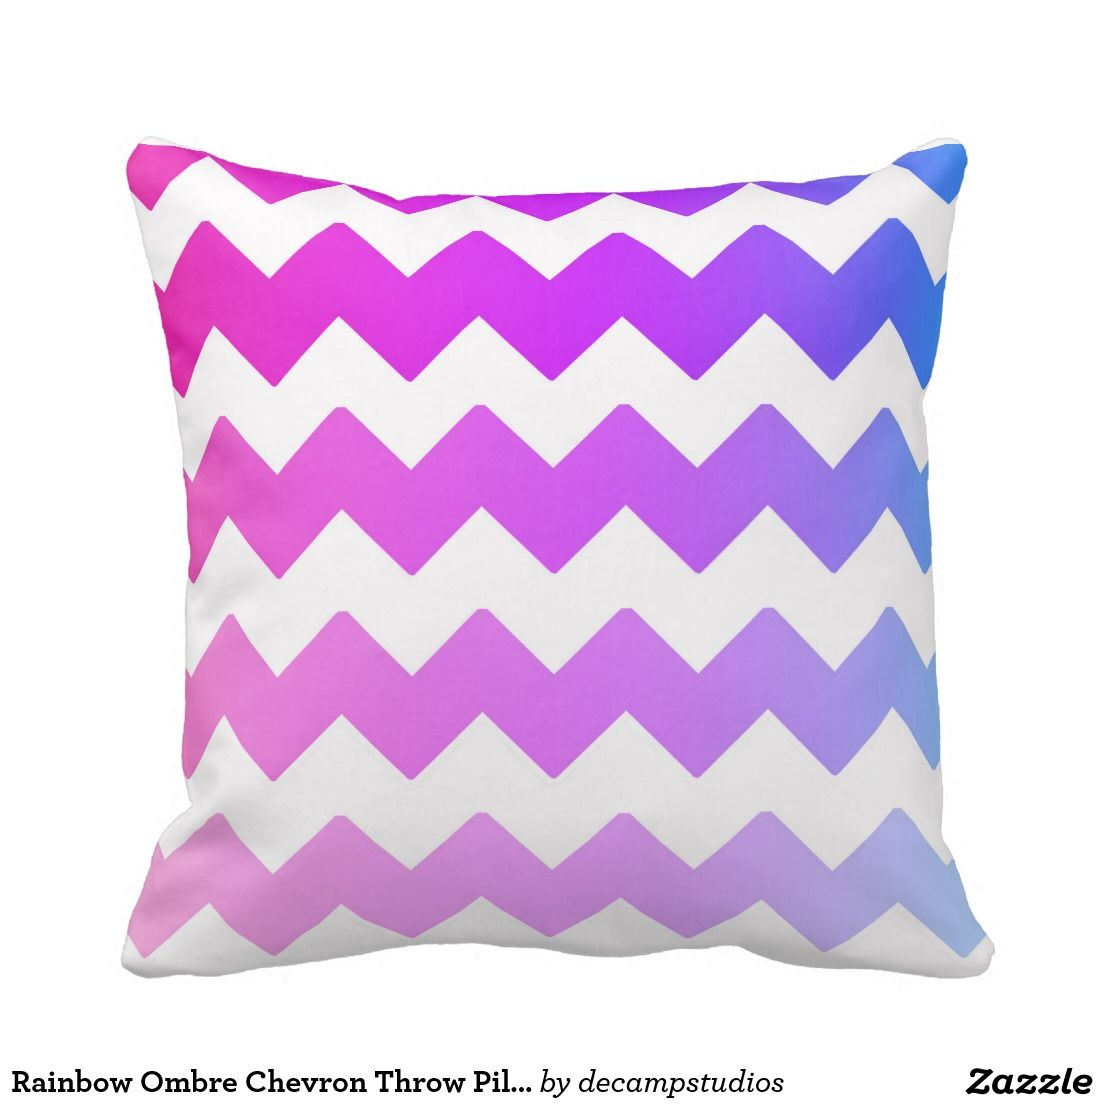 Rainbow Ombre Chevron Throw Pillow  Zazzlecom  Bedroom